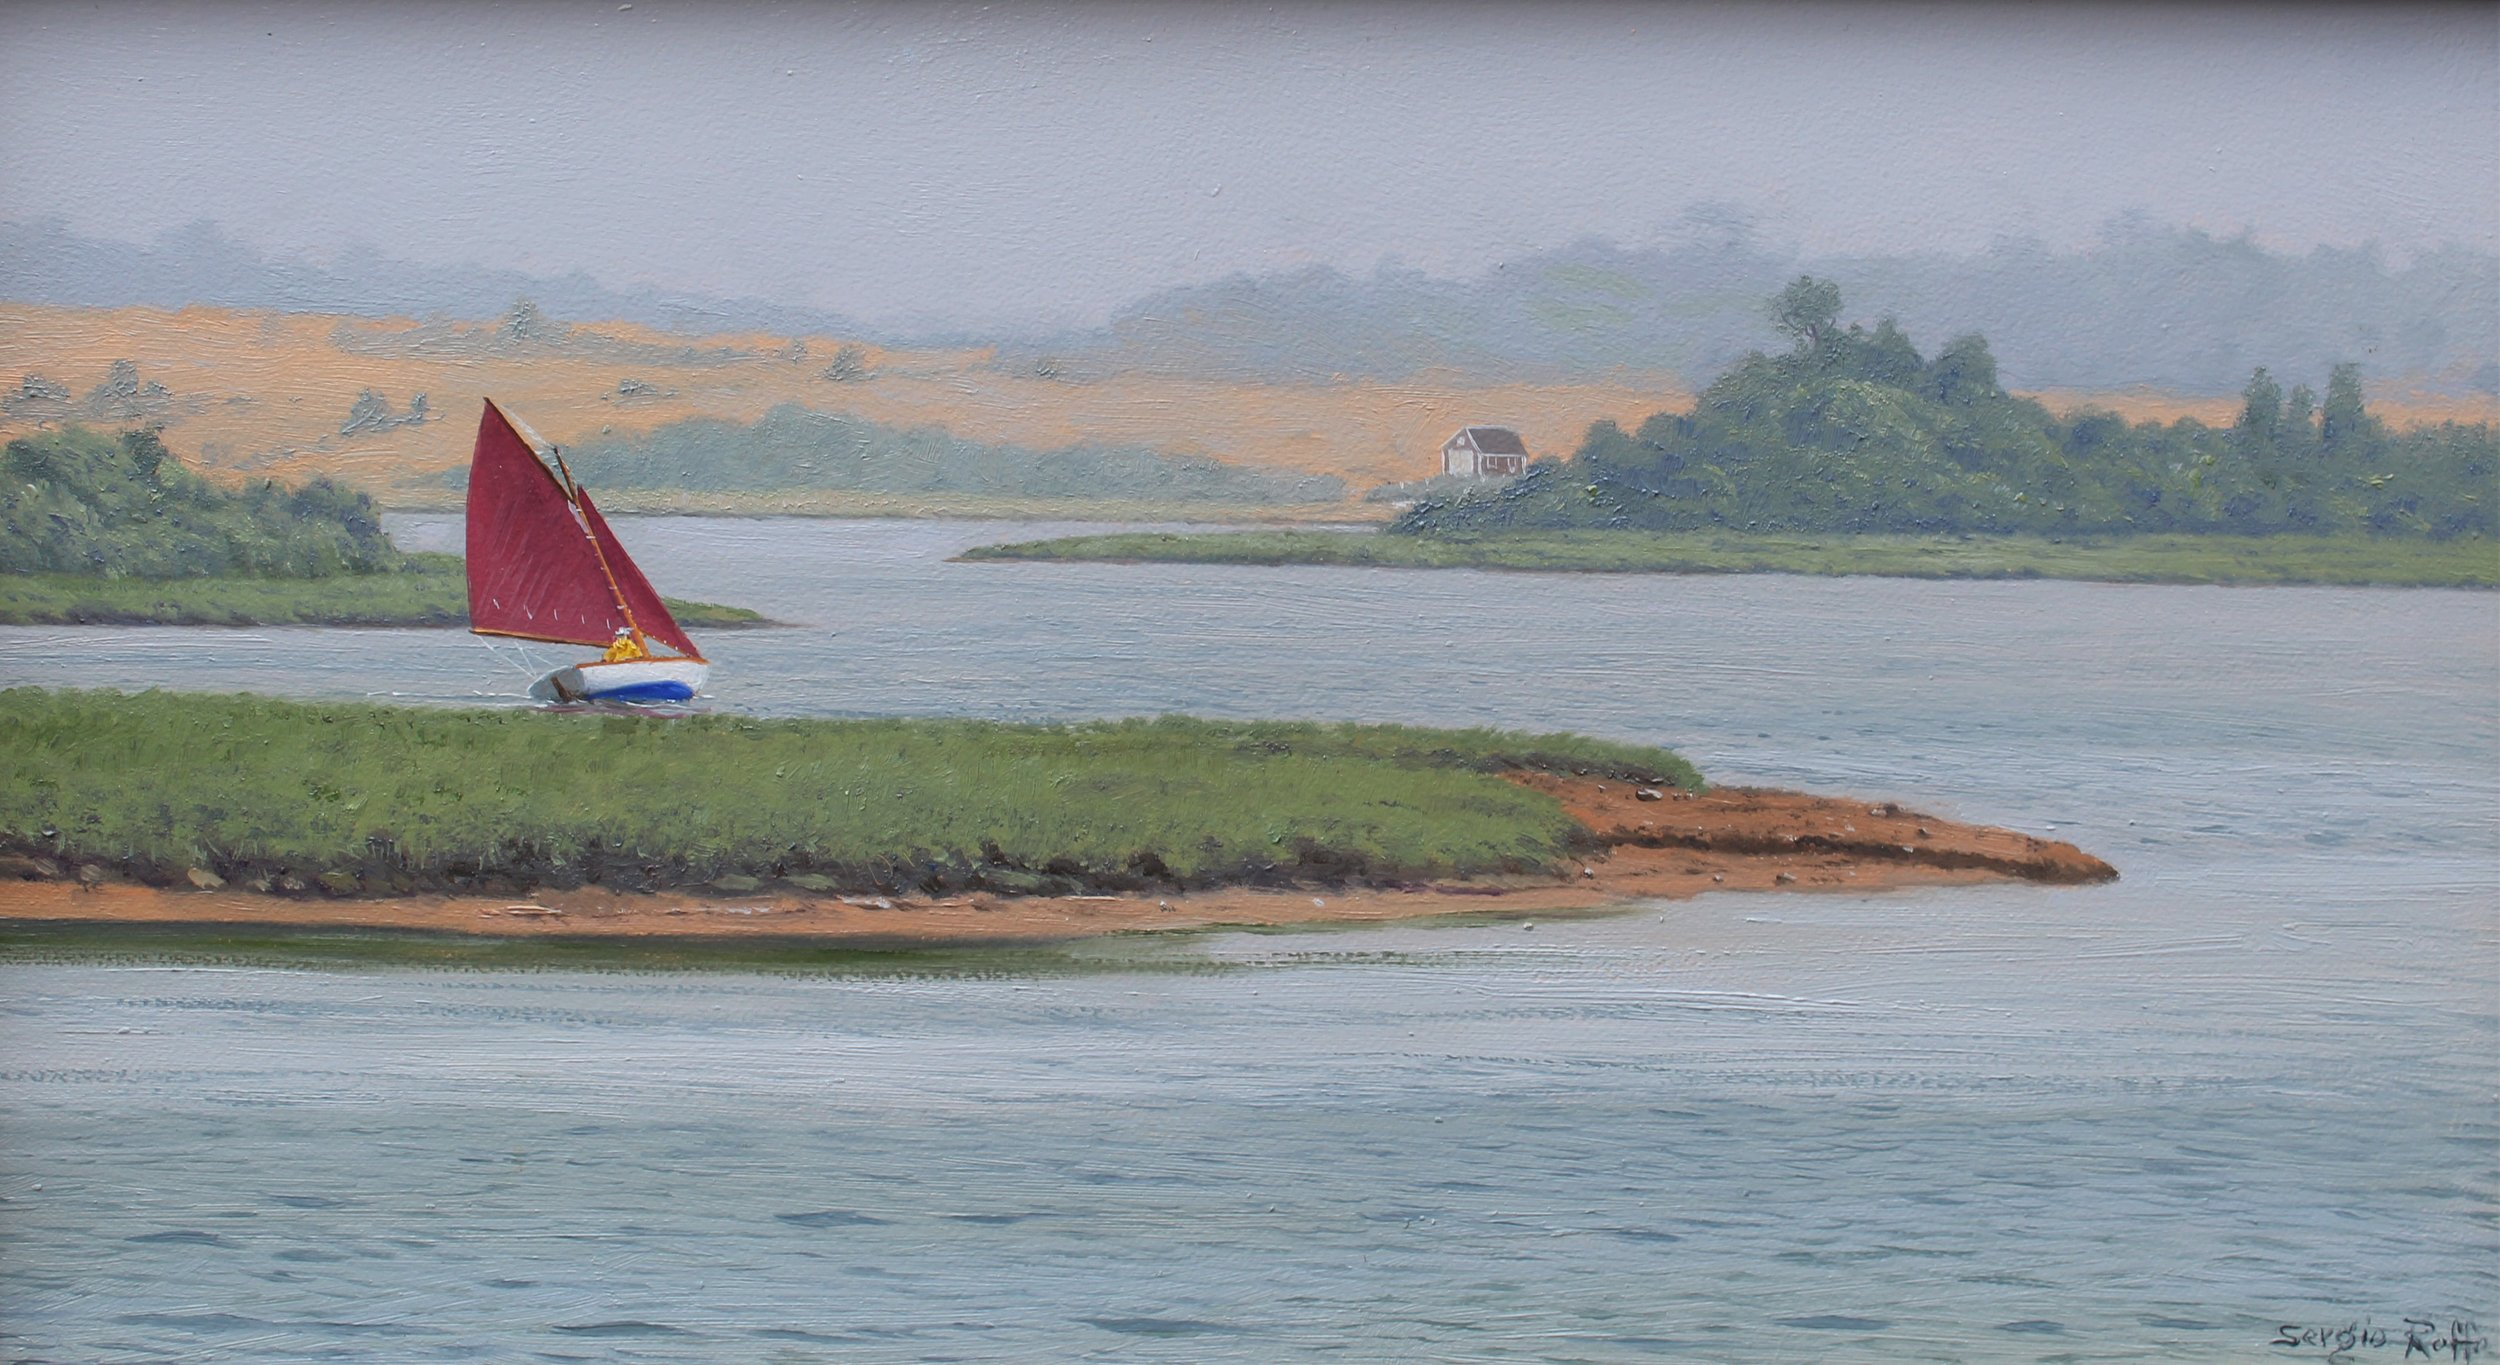 SERGIO ROFFO    Herreshoff Tacking, Chilmark, MA    A Herreshoff 12.5 with tanbark sails navigates the waterways of Chilmark Pond in Martha's Vineyard.  10 x 18 inches